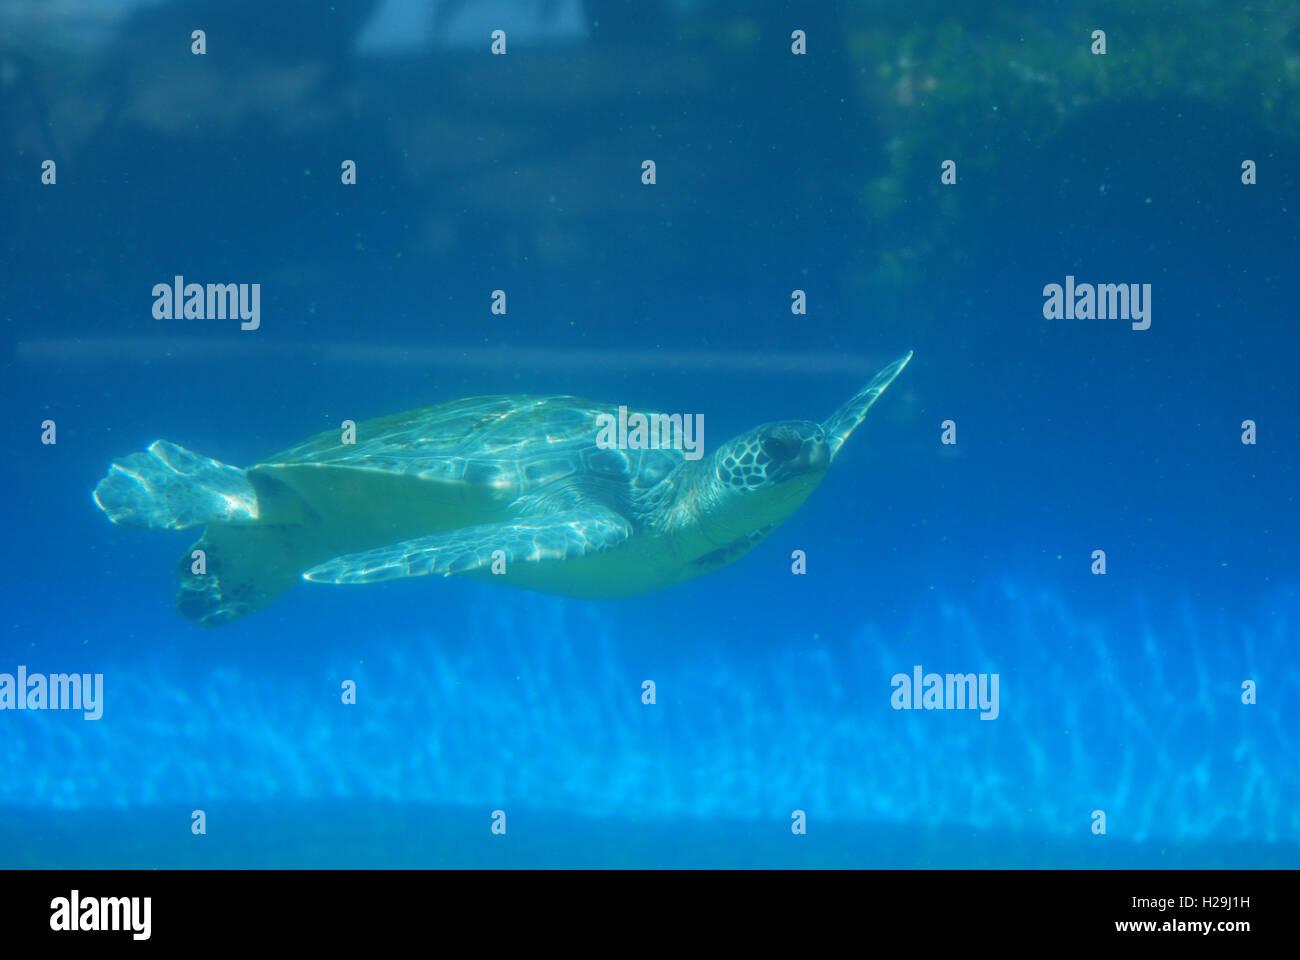 Amazing sea turtle gliding along underwater. - Stock Image